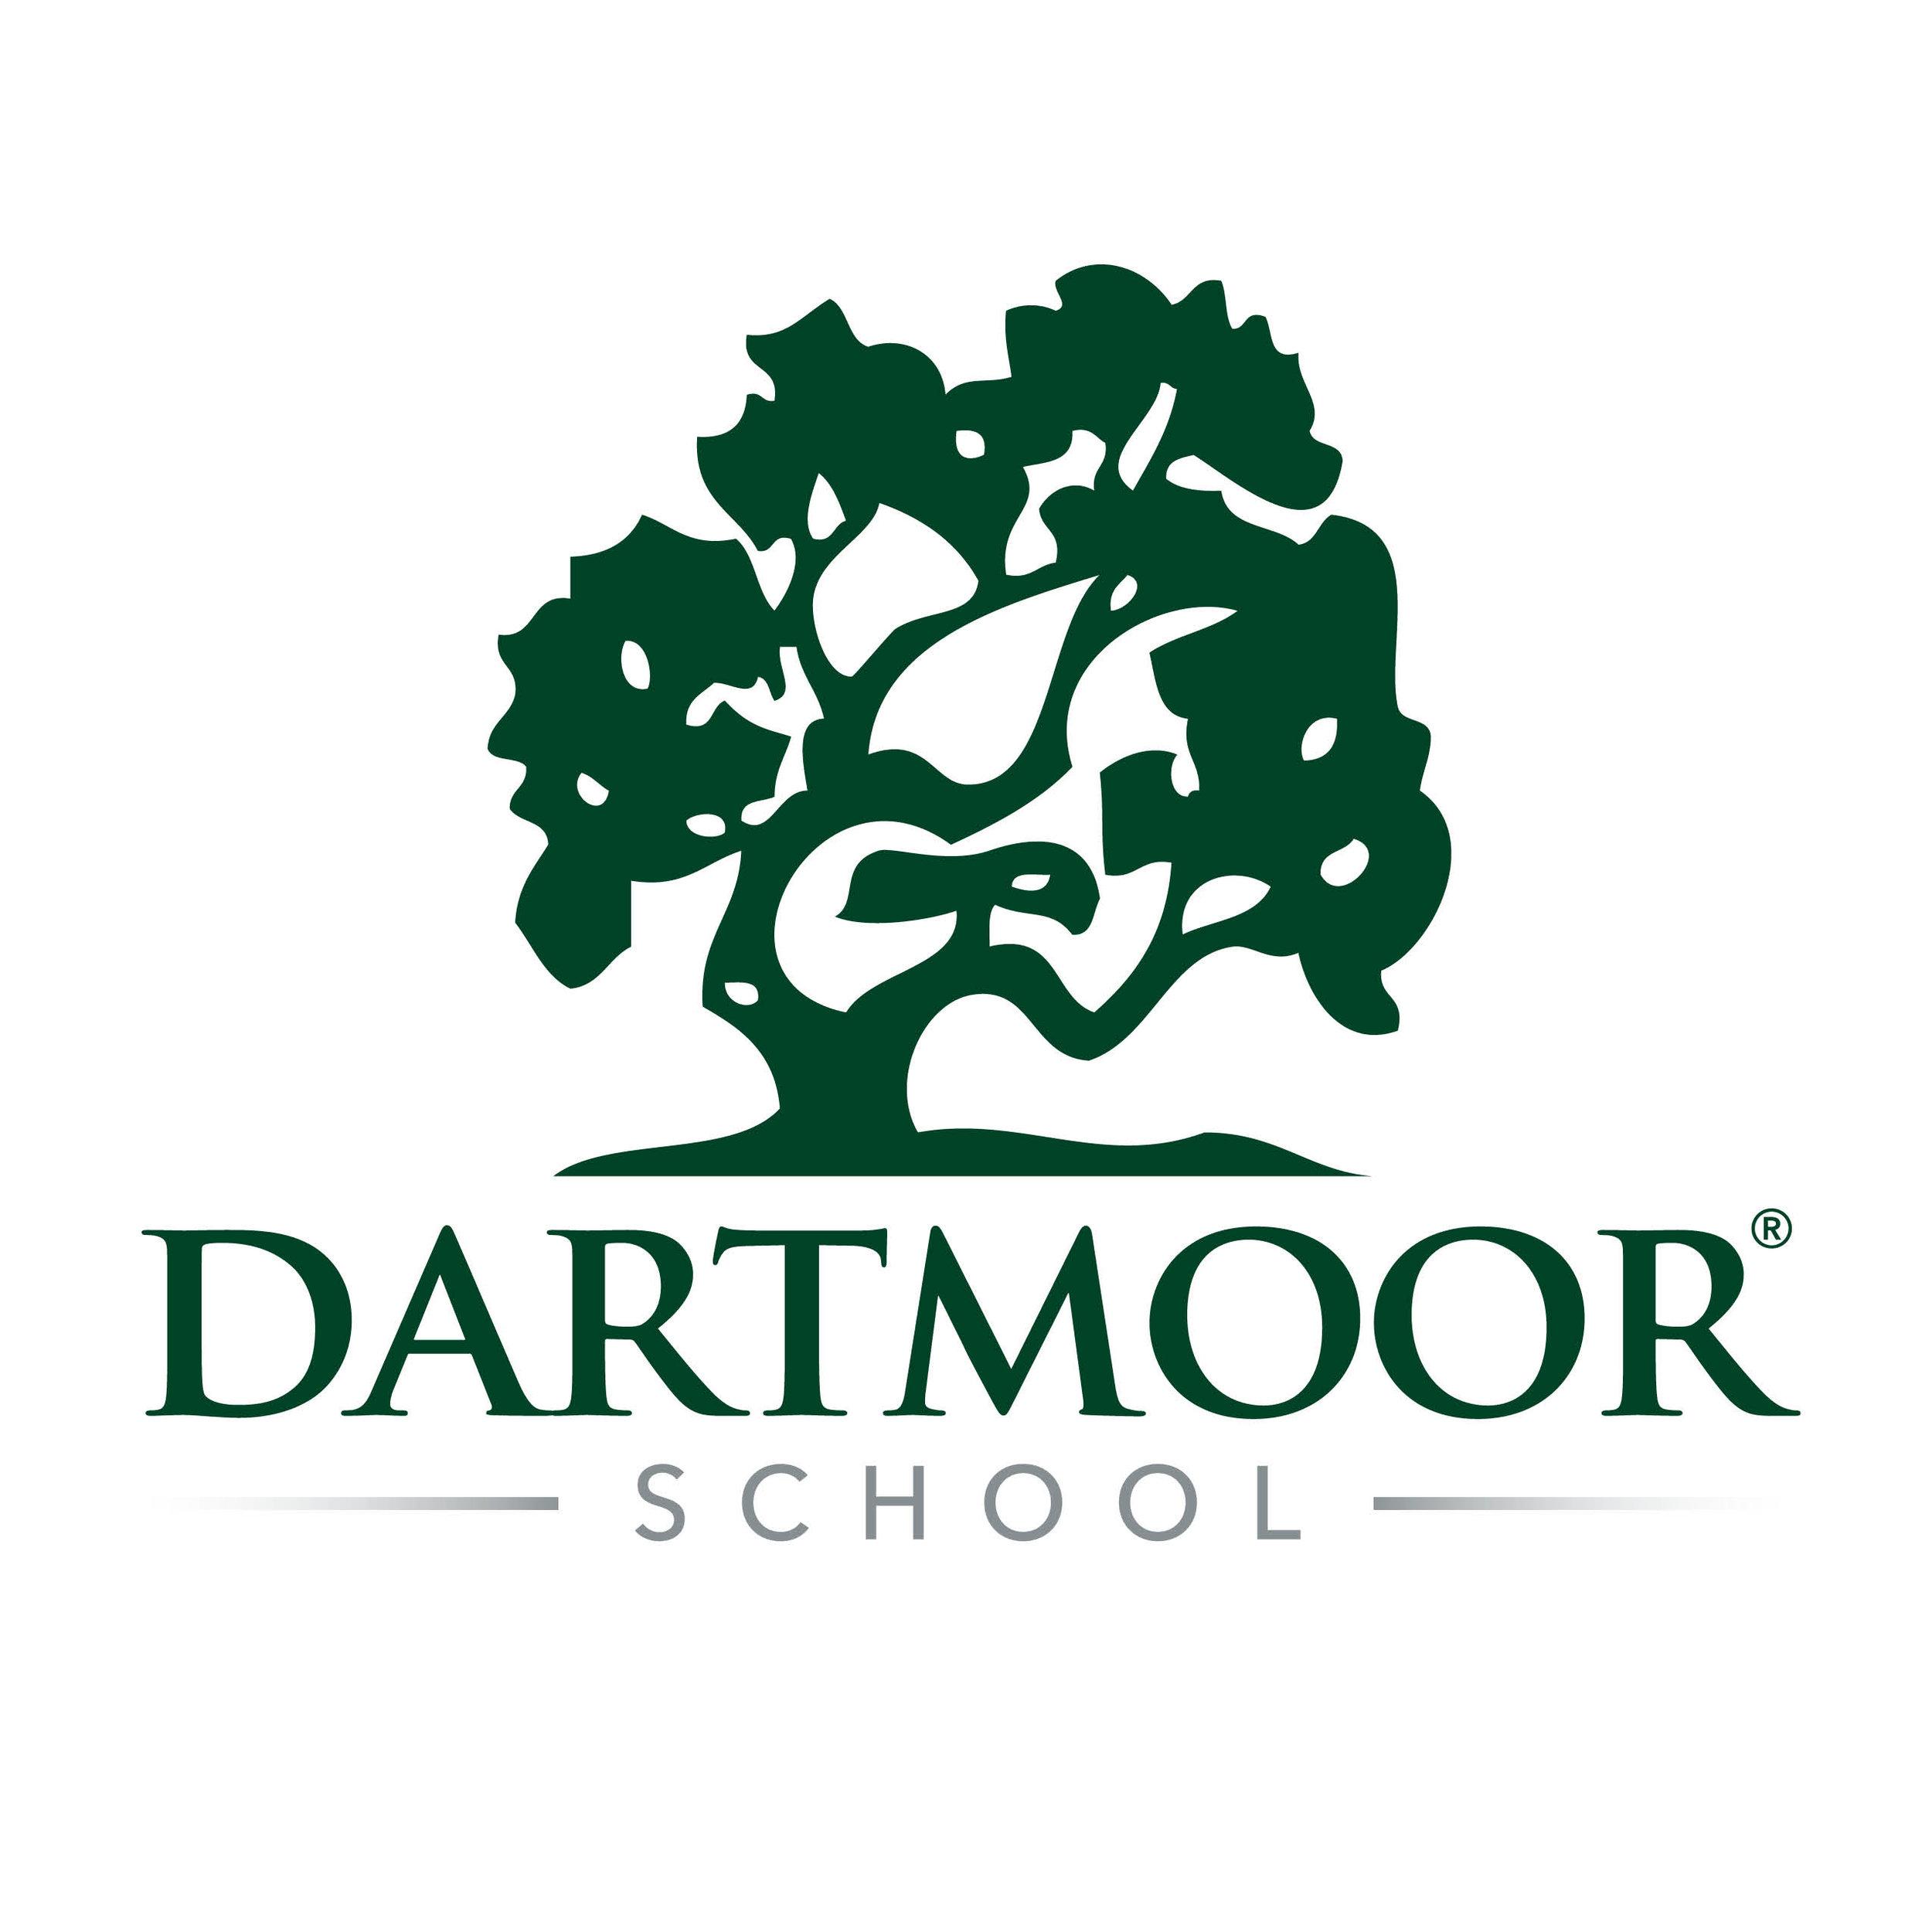 Dartmoor 2018 School-Logo.jpg